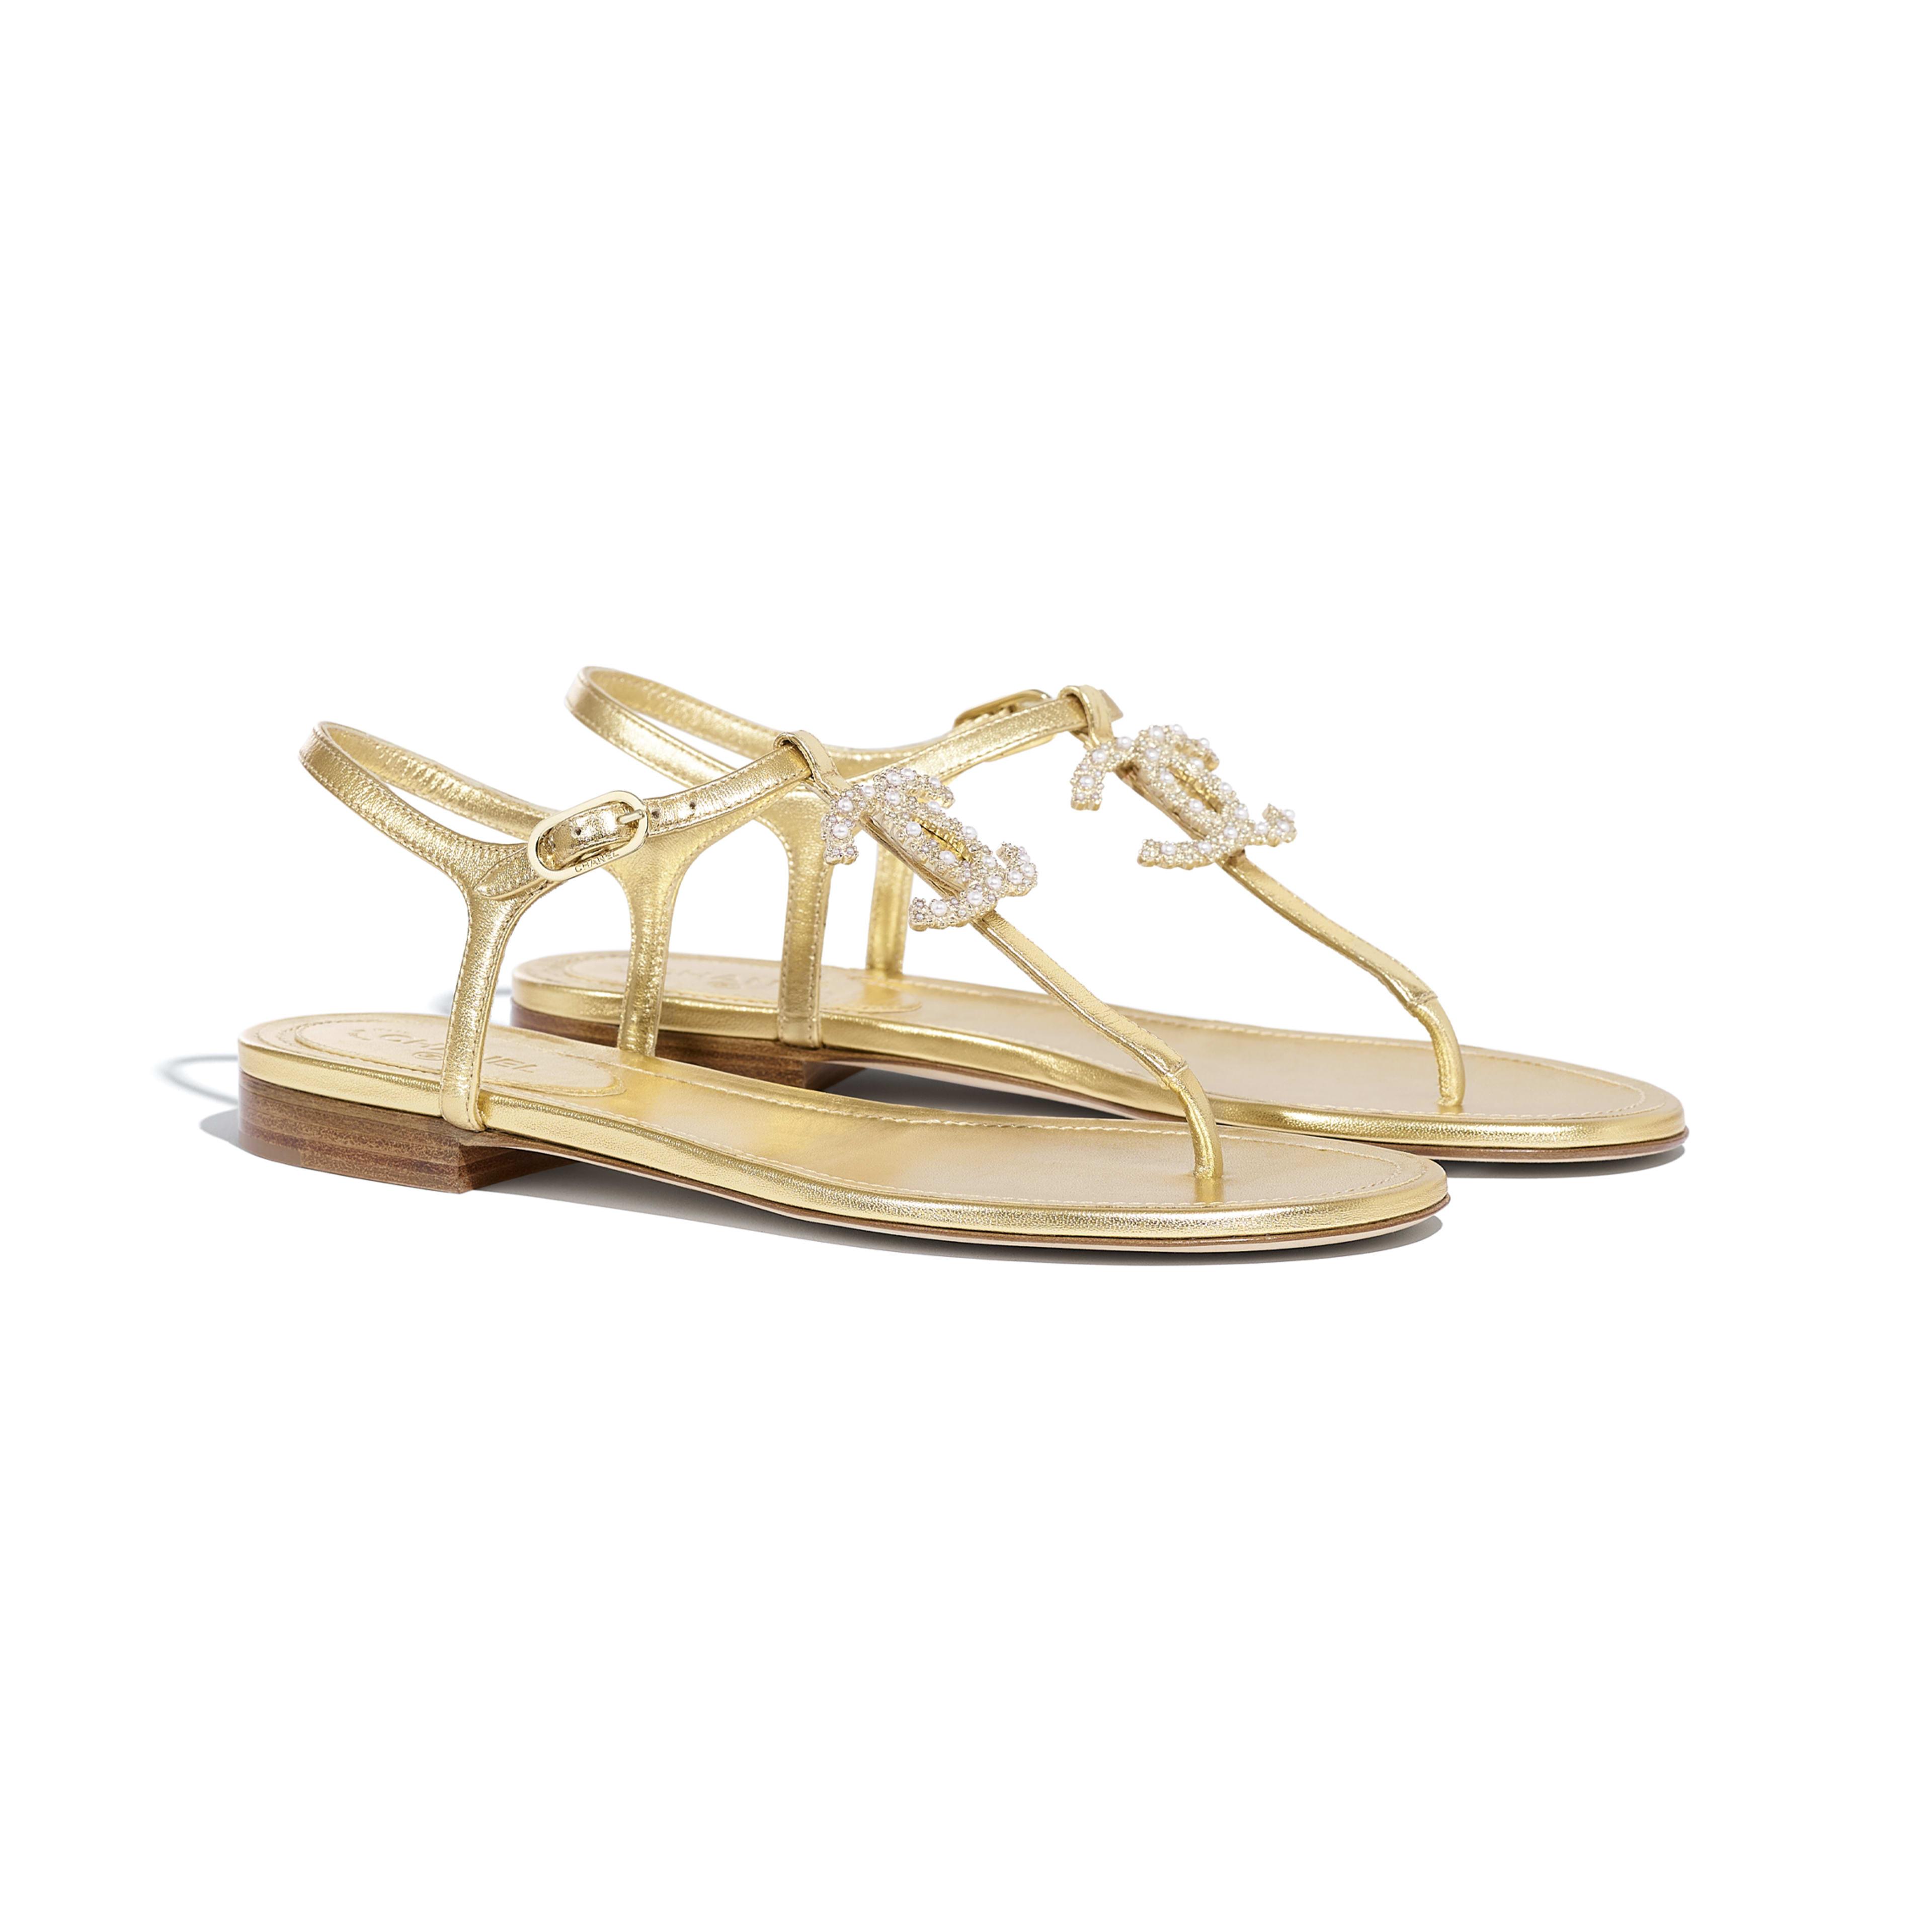 Laminated Lambskin Gold Sandals   CHANEL